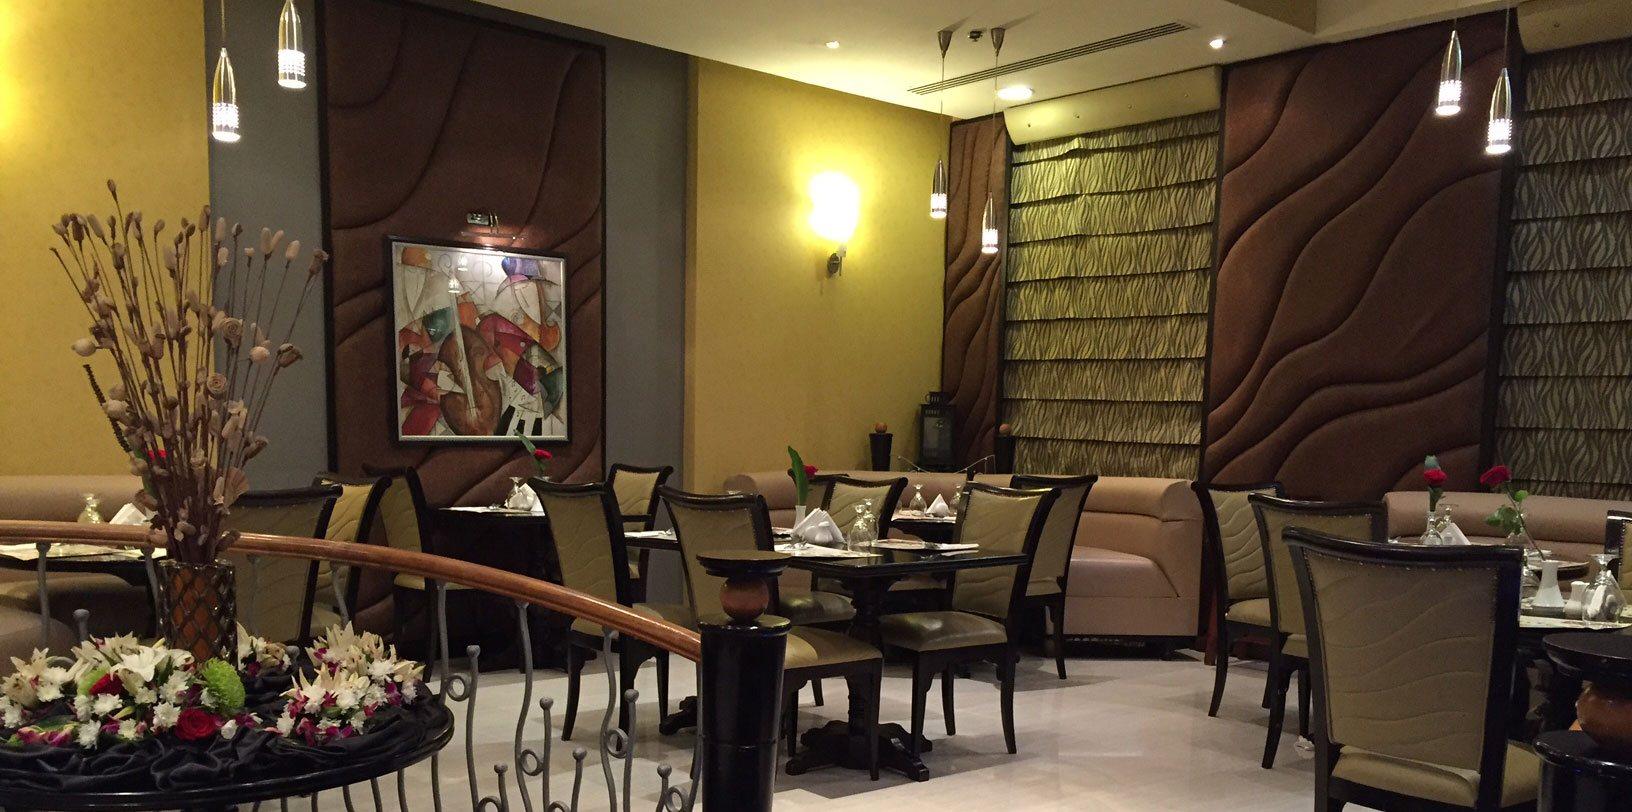 Policies of Al Jawhara Gardens Hotel